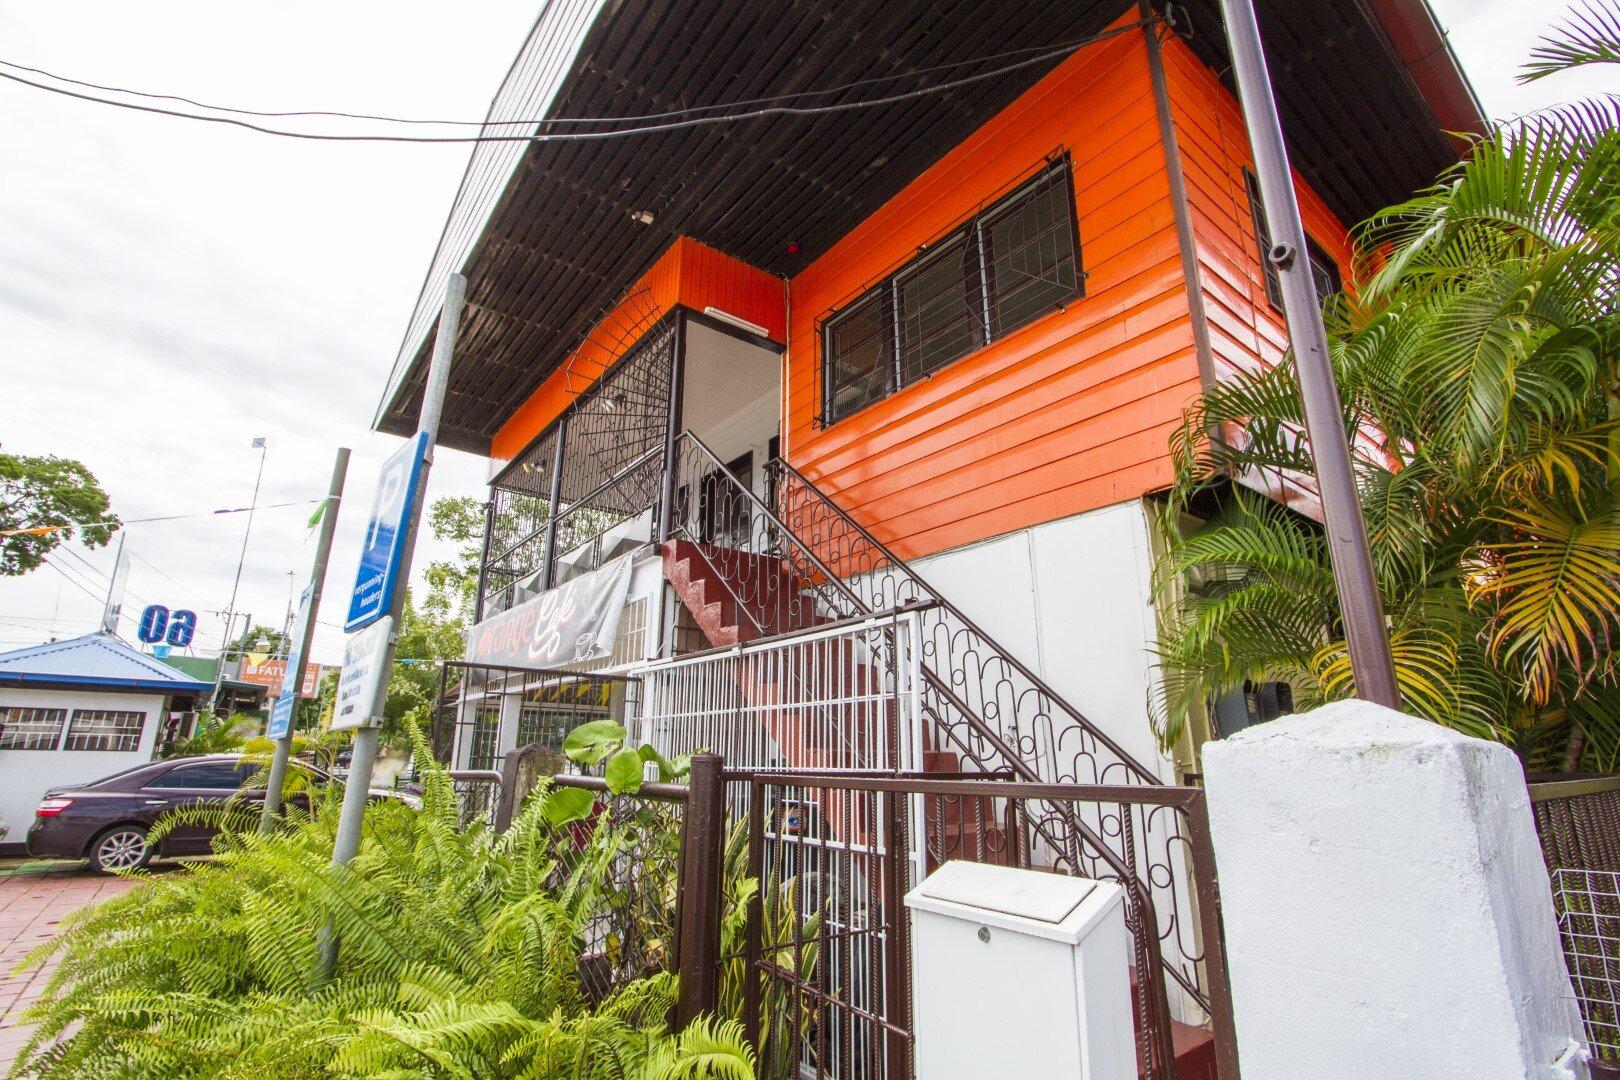 Sommelsdijckstraat nr. 1 - Representatieve kantoorruimten hartje Centrum - Surgoed Makelaardij NV - Paramaribo, Suriname